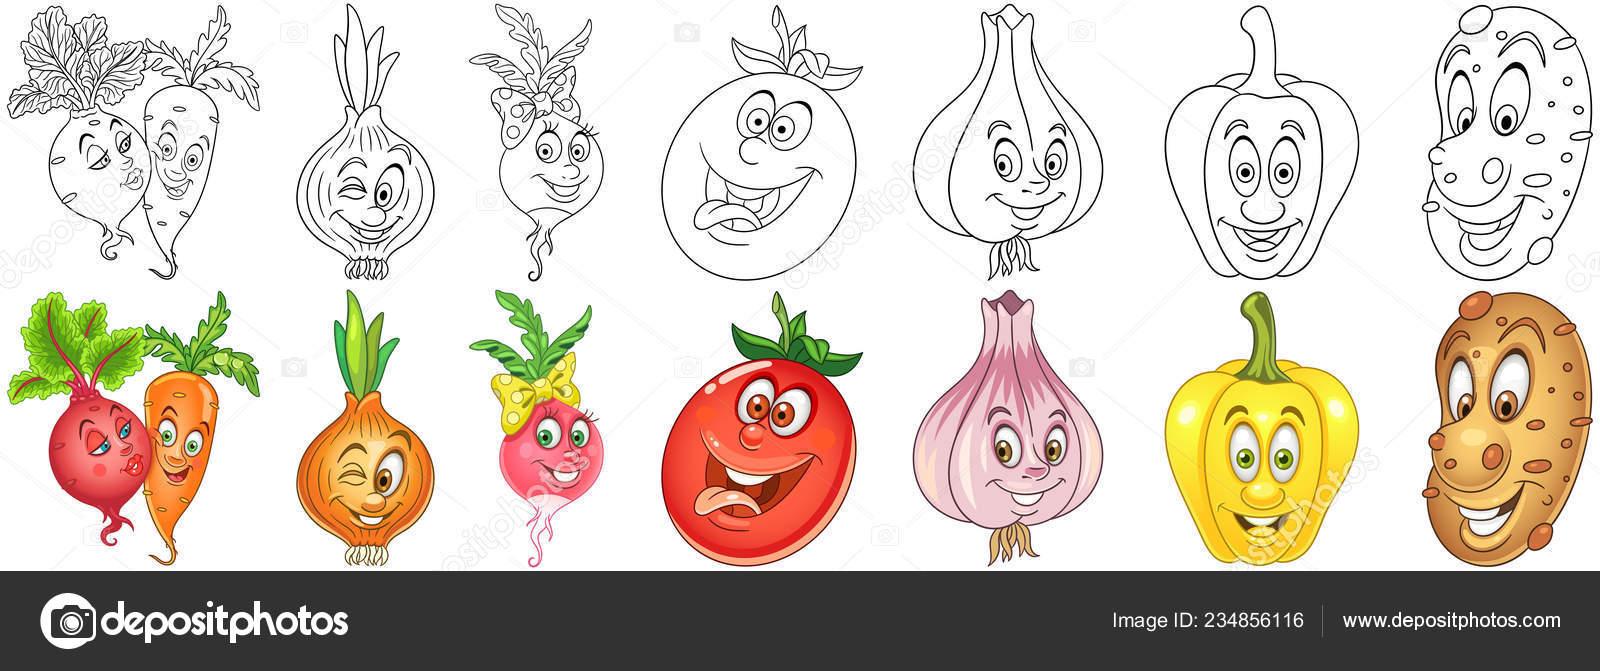 Coloriage Pomme Et Oignon Dessin Anime.Ensemble Legumes Dessin Anime Coloriage Des Personnages